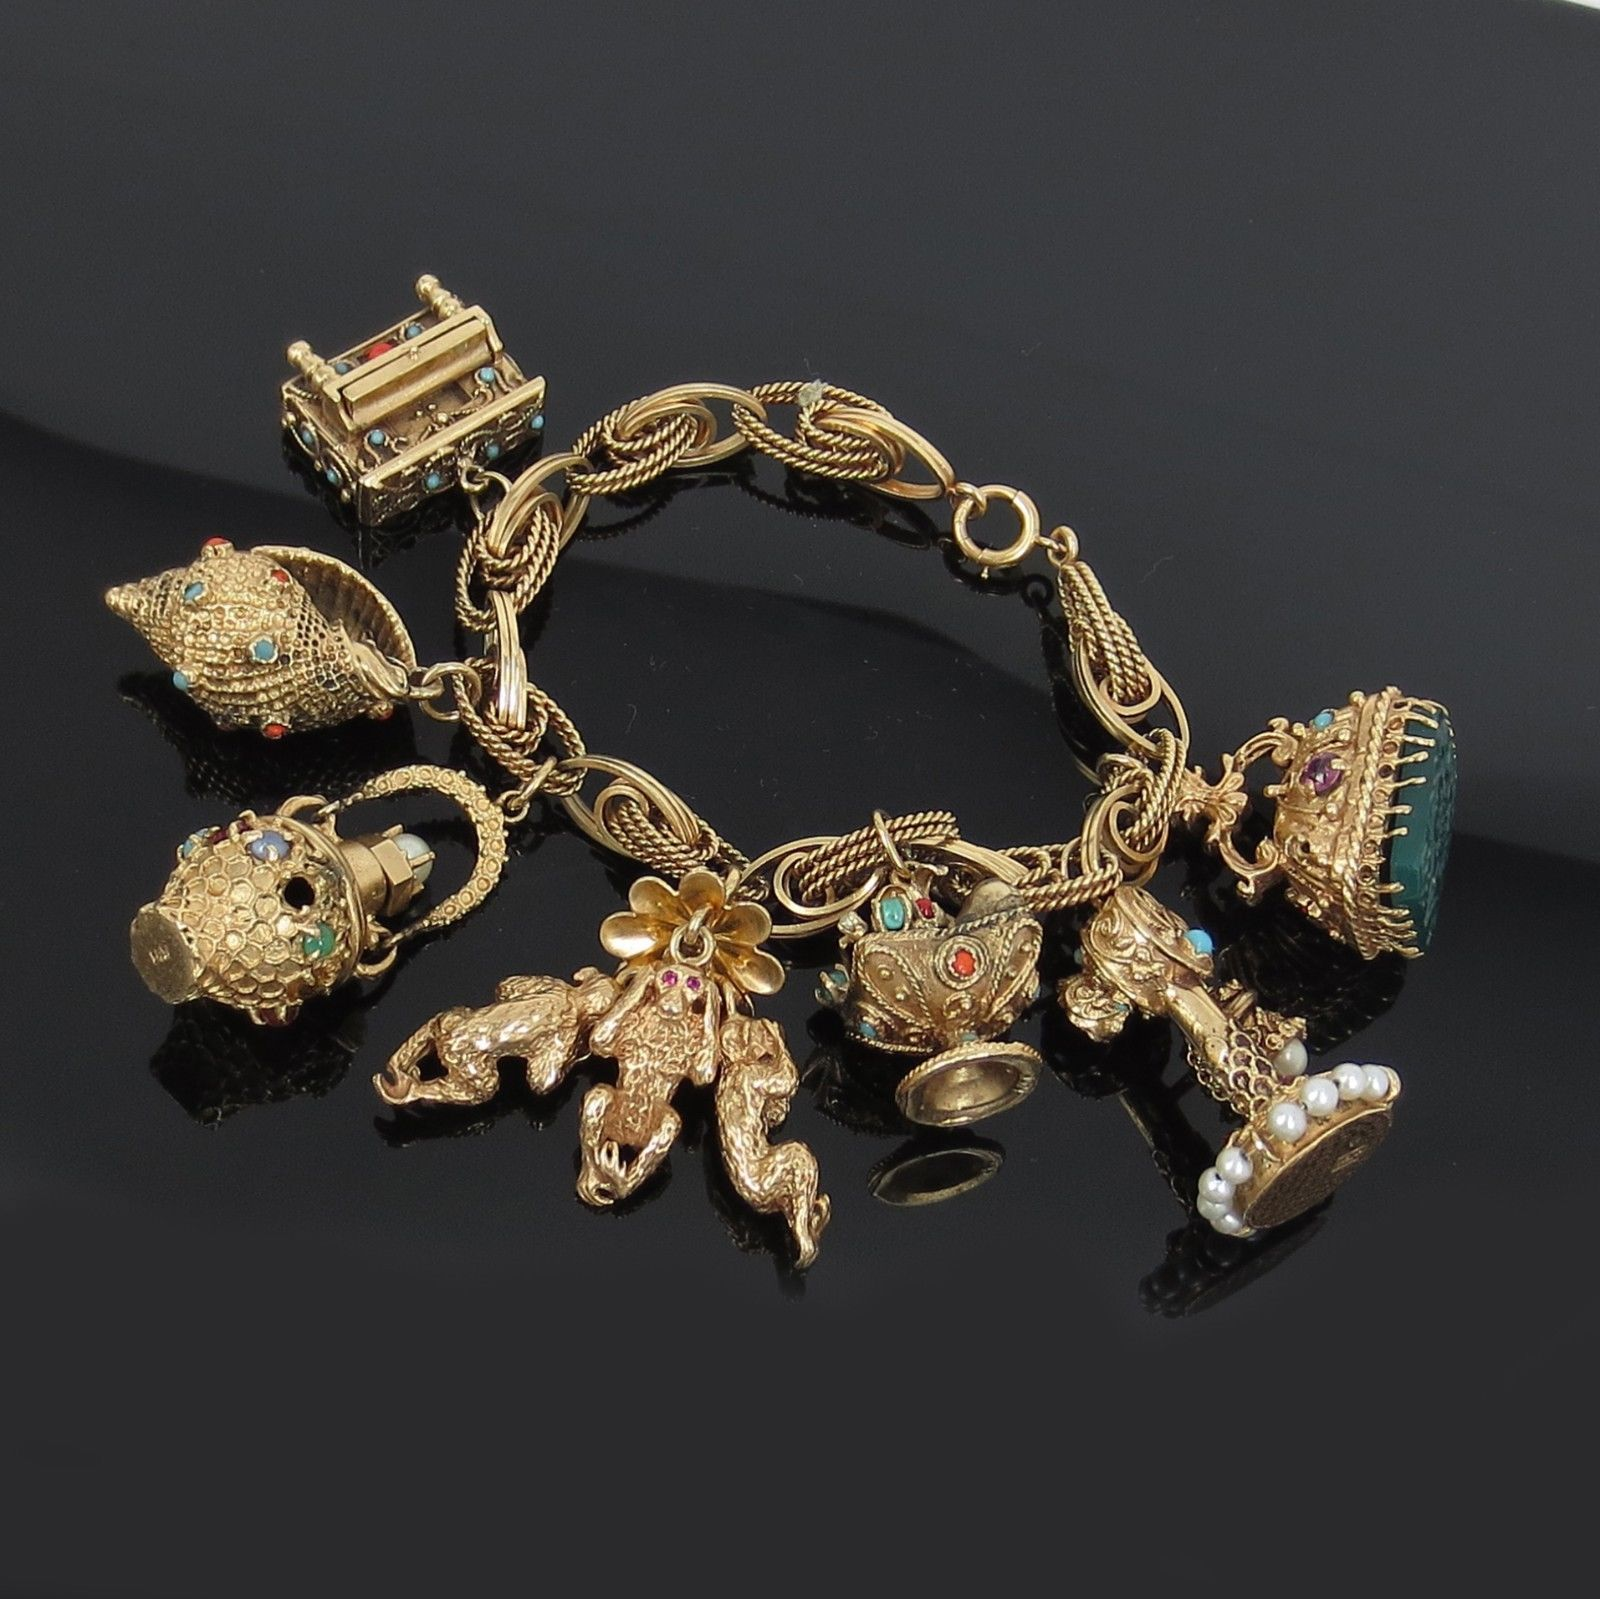 14k Yellow Gold Charm Bracelet: Details About VINTAGE 14K YELLOW GOLD MULTI-GEMSTONE